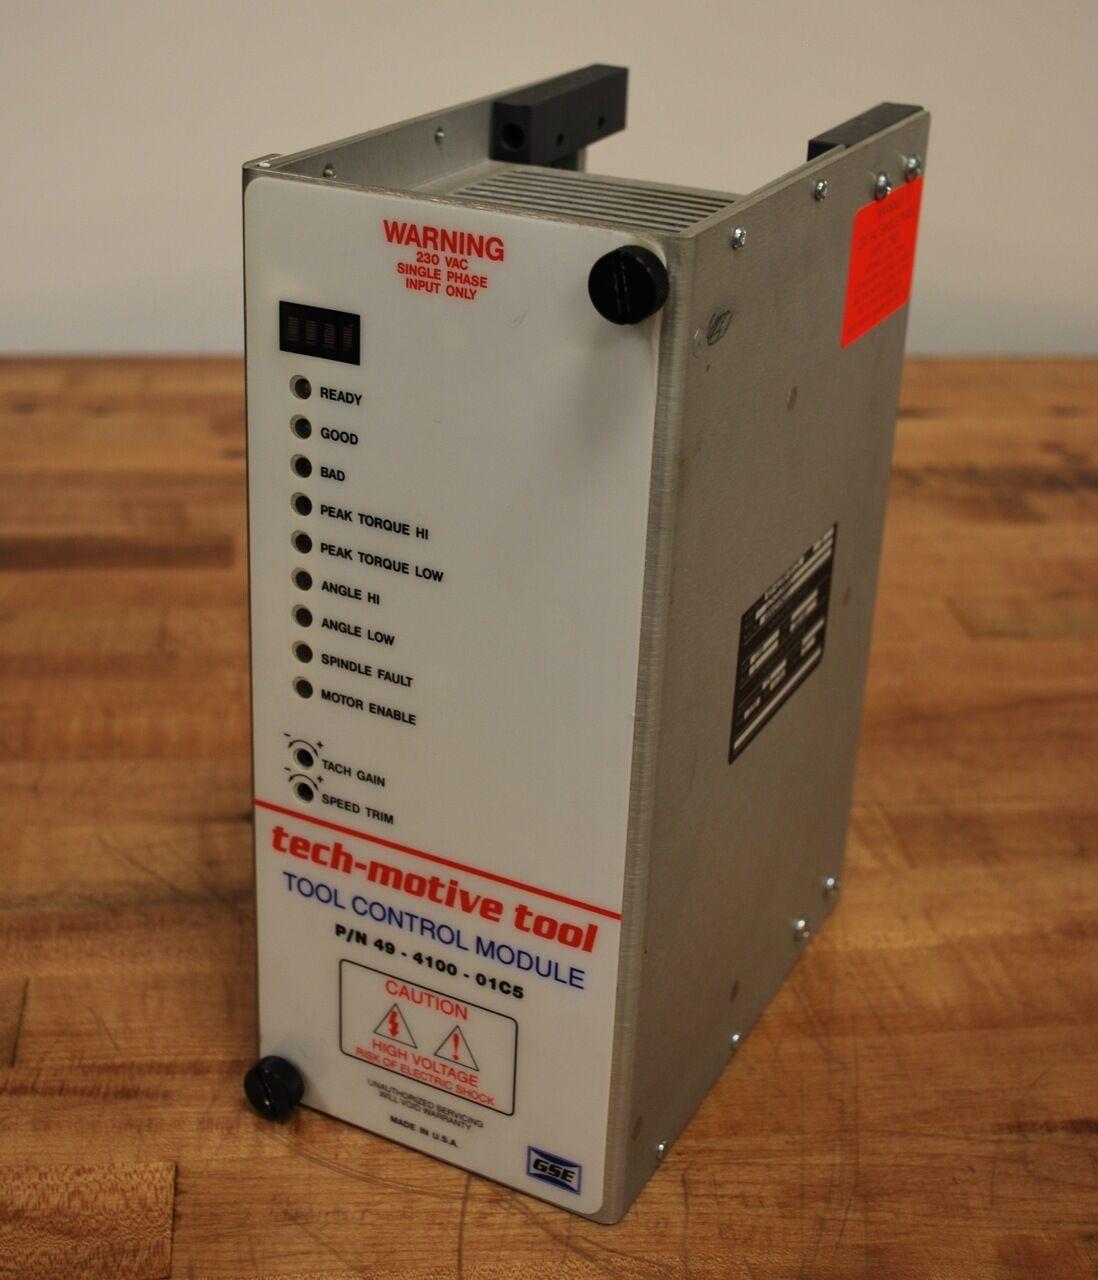 Tech-motive tool 49-4100-01C5, Tool Control Module, REV  B, 230vac - 49410001C5